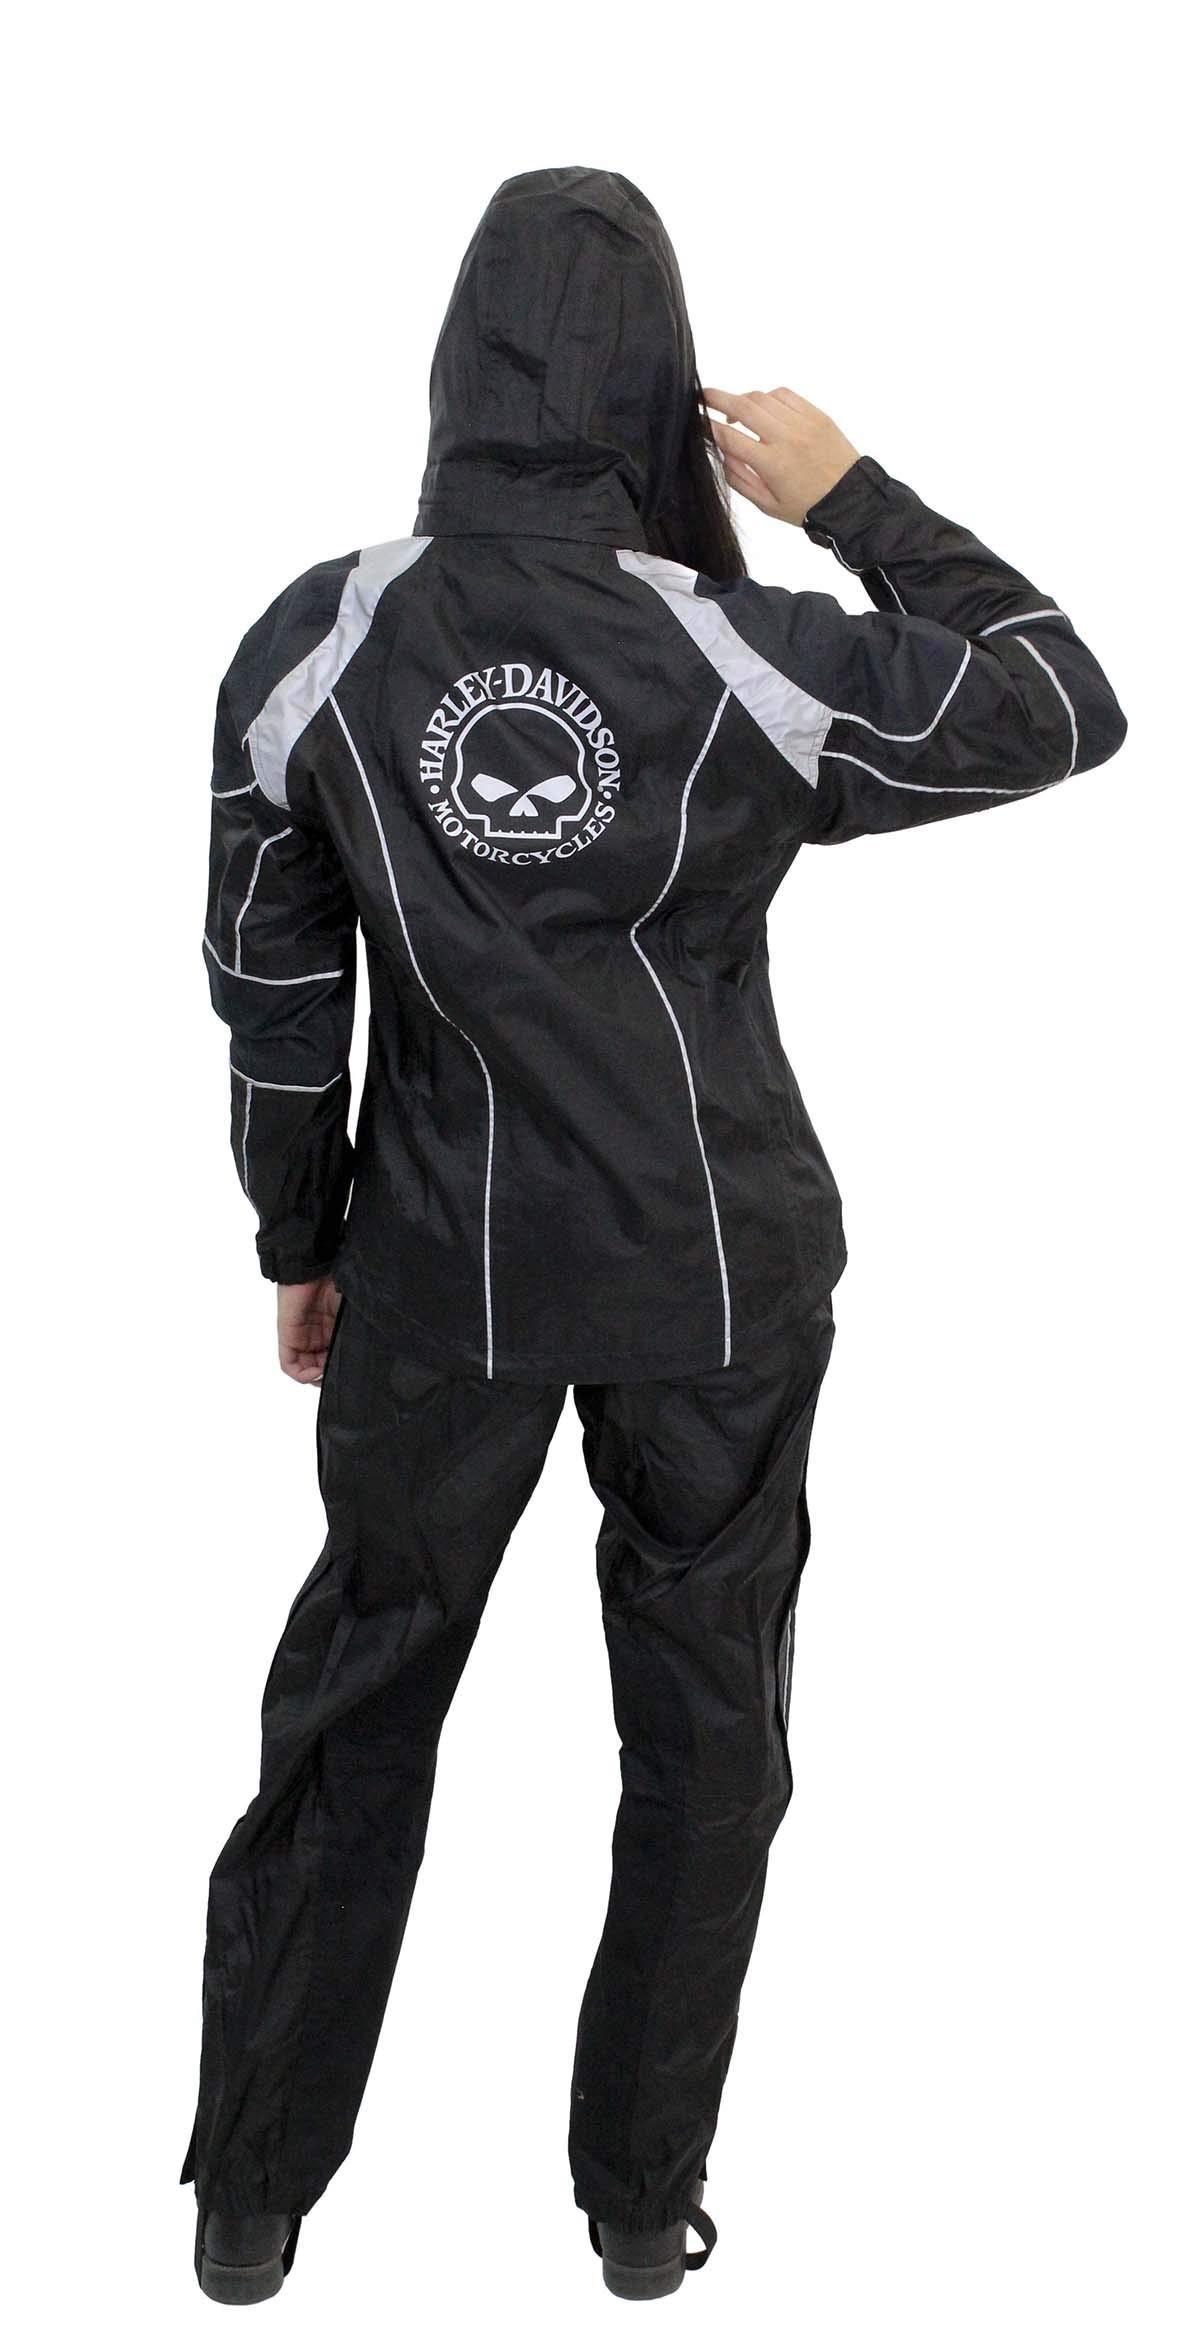 Harley-Davidson Womens Willie G Skull Reflective Waterproof Black Rain Suit 98363-15VW (Medium)